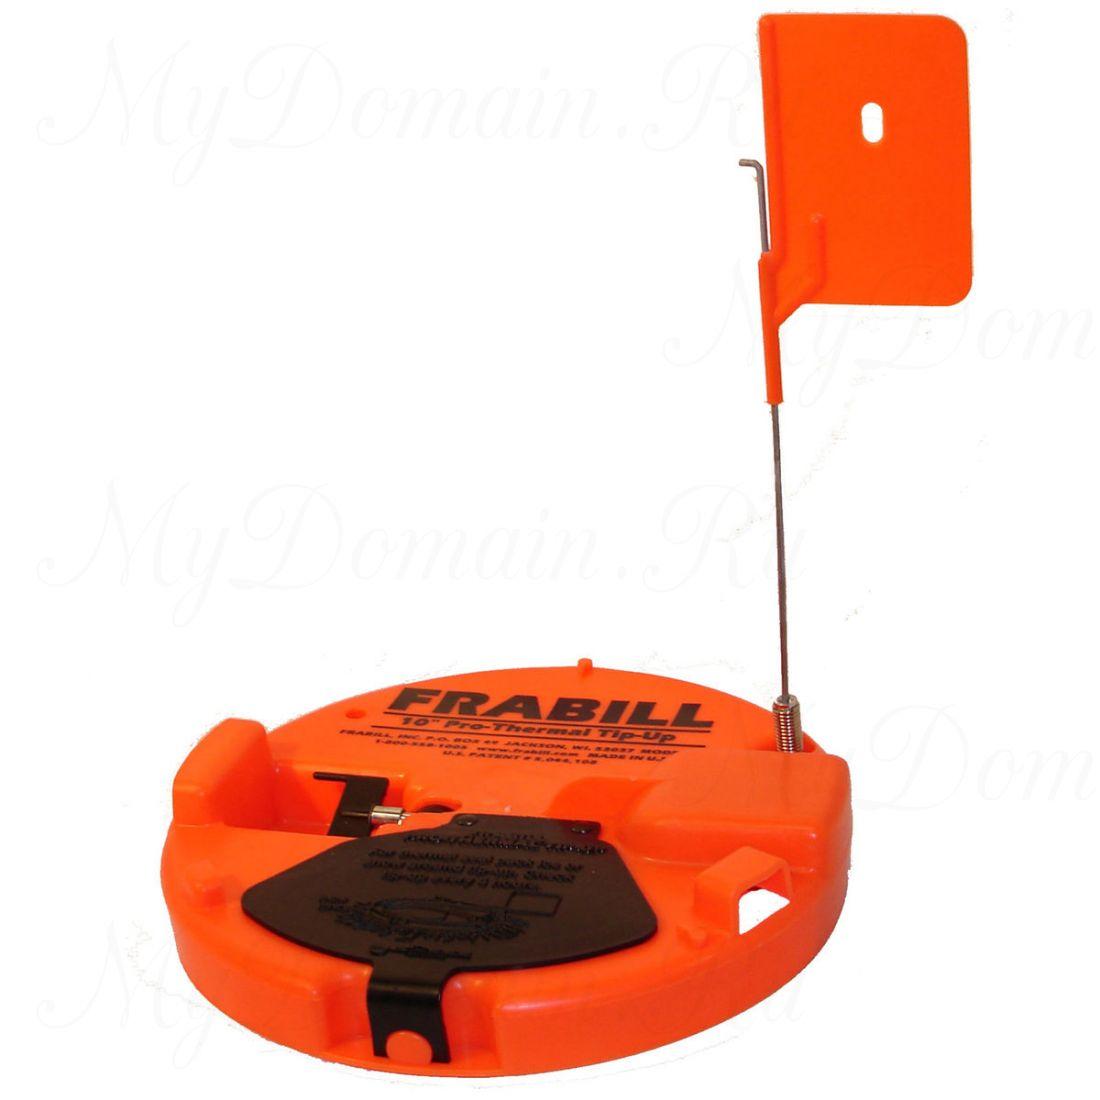 Жерлица Frabill Pro Thermal Tip-Up круглая, термальная, оранжевая